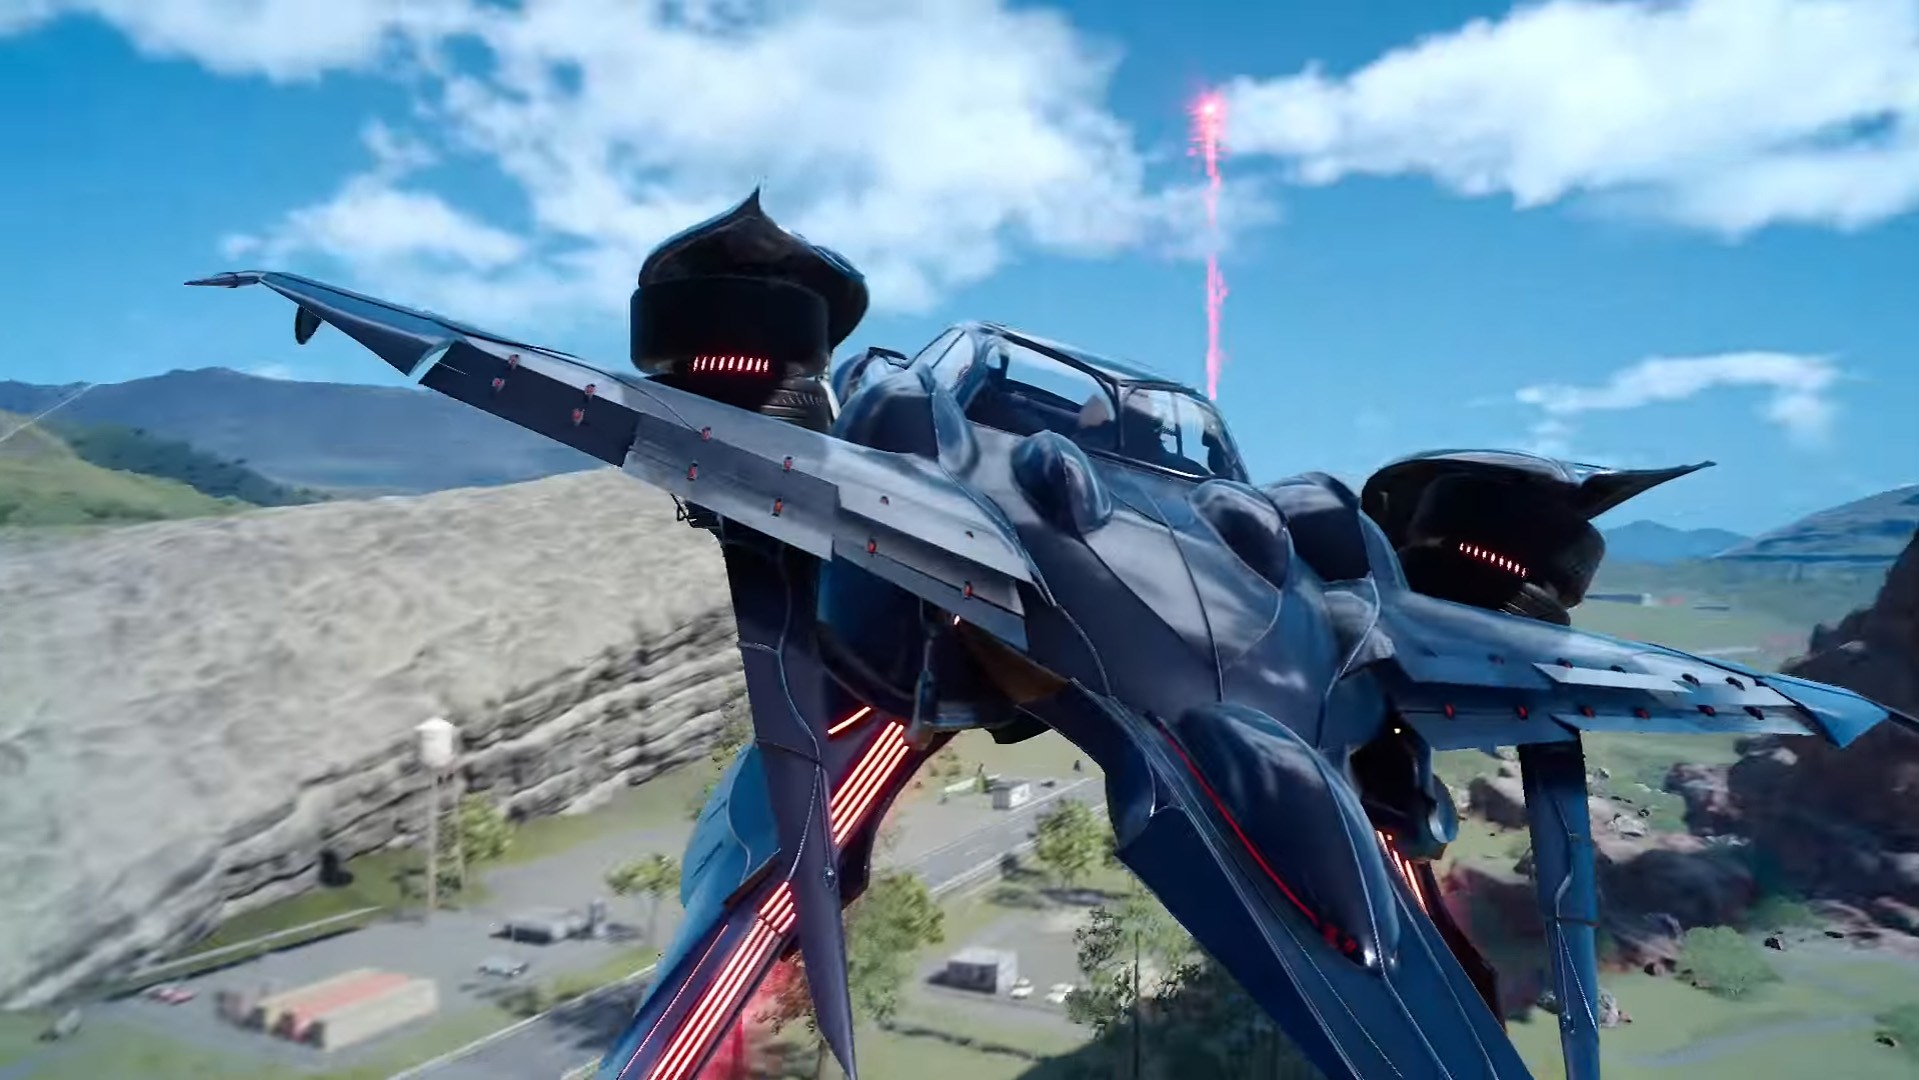 How do you unlock Final Fantasy 15's flying car, the Regalia Type-F?